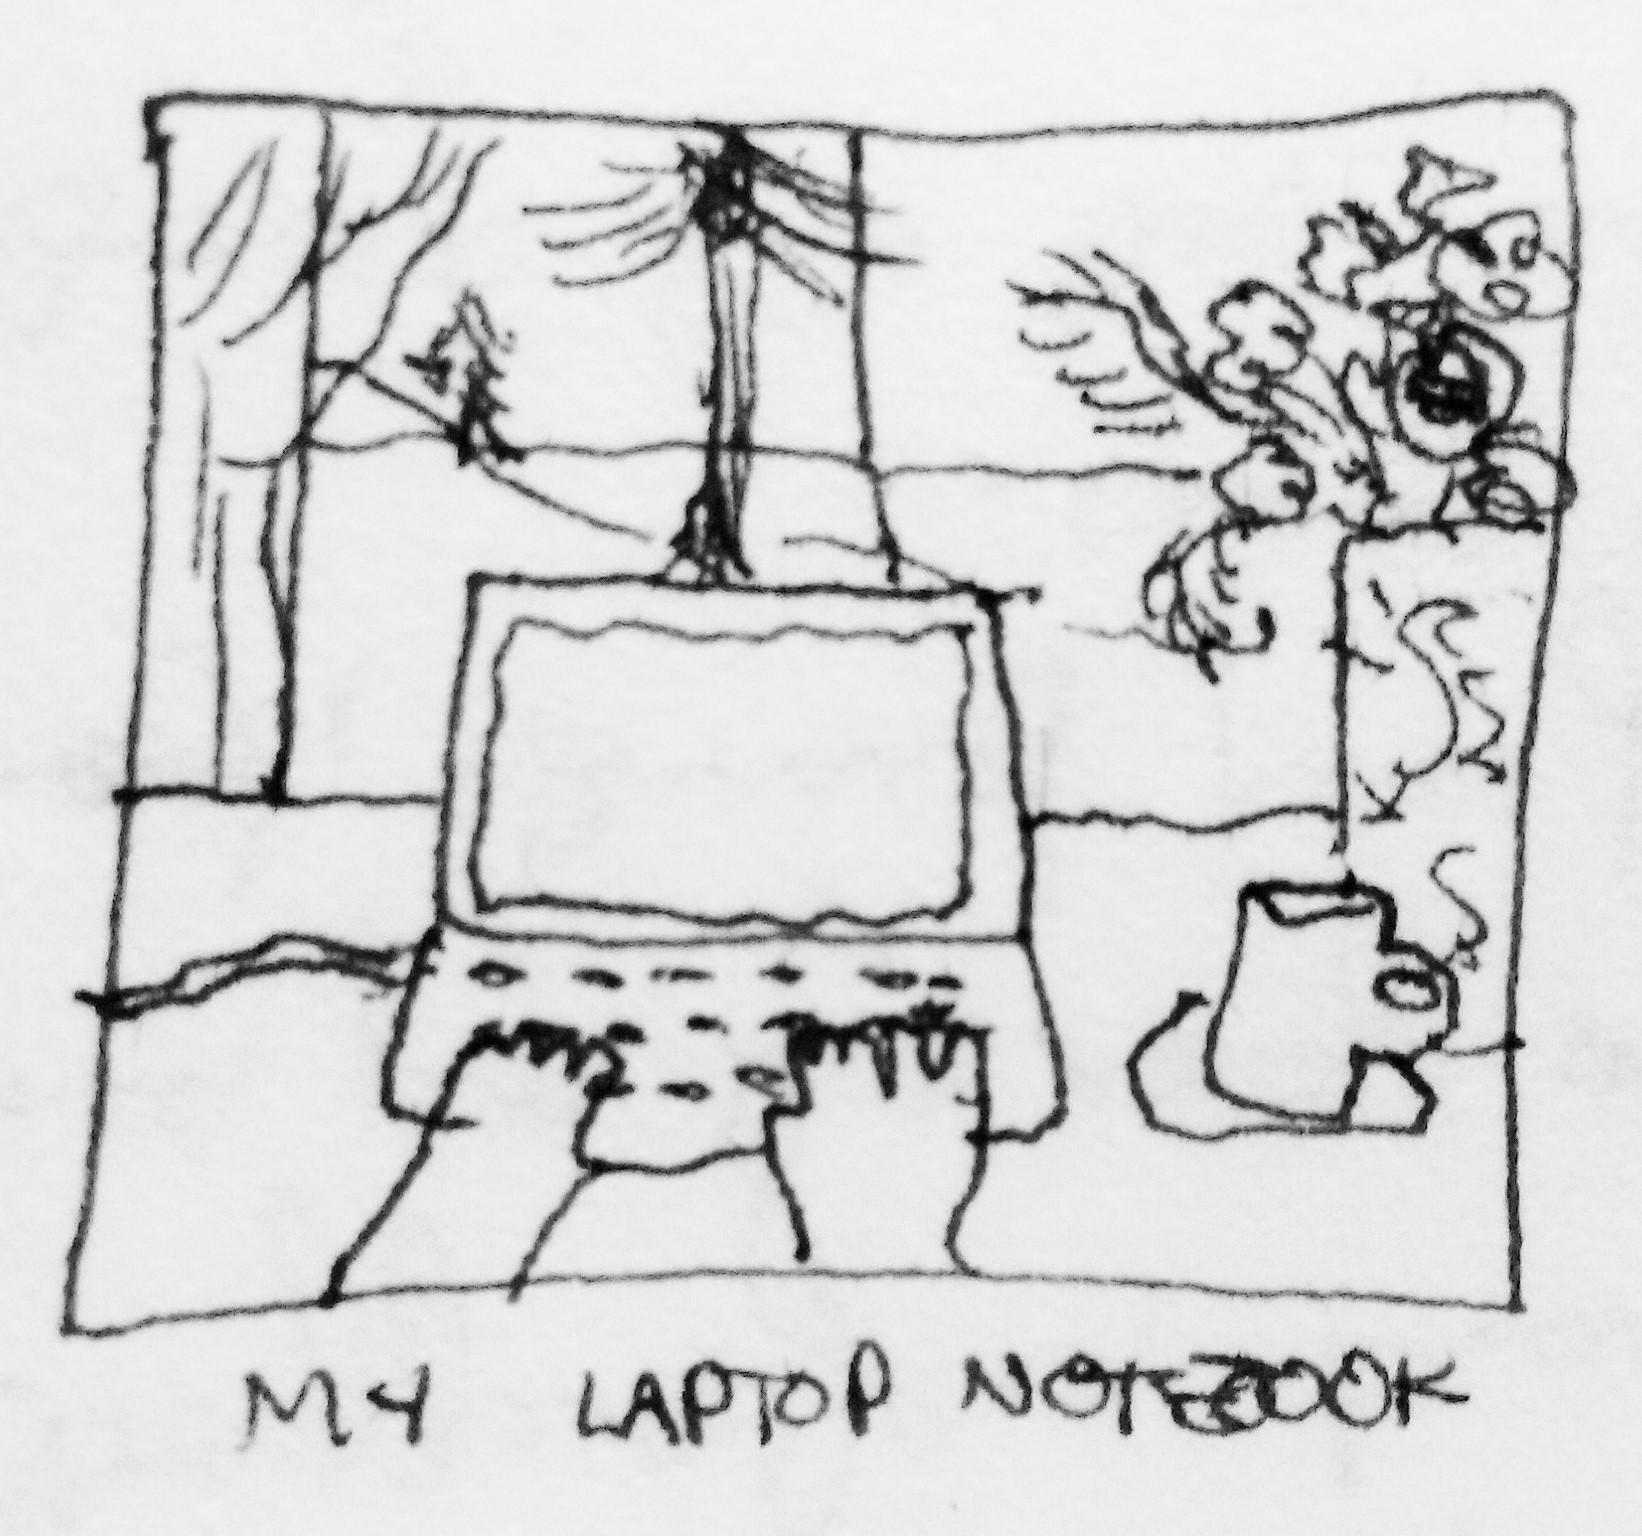 my laptop